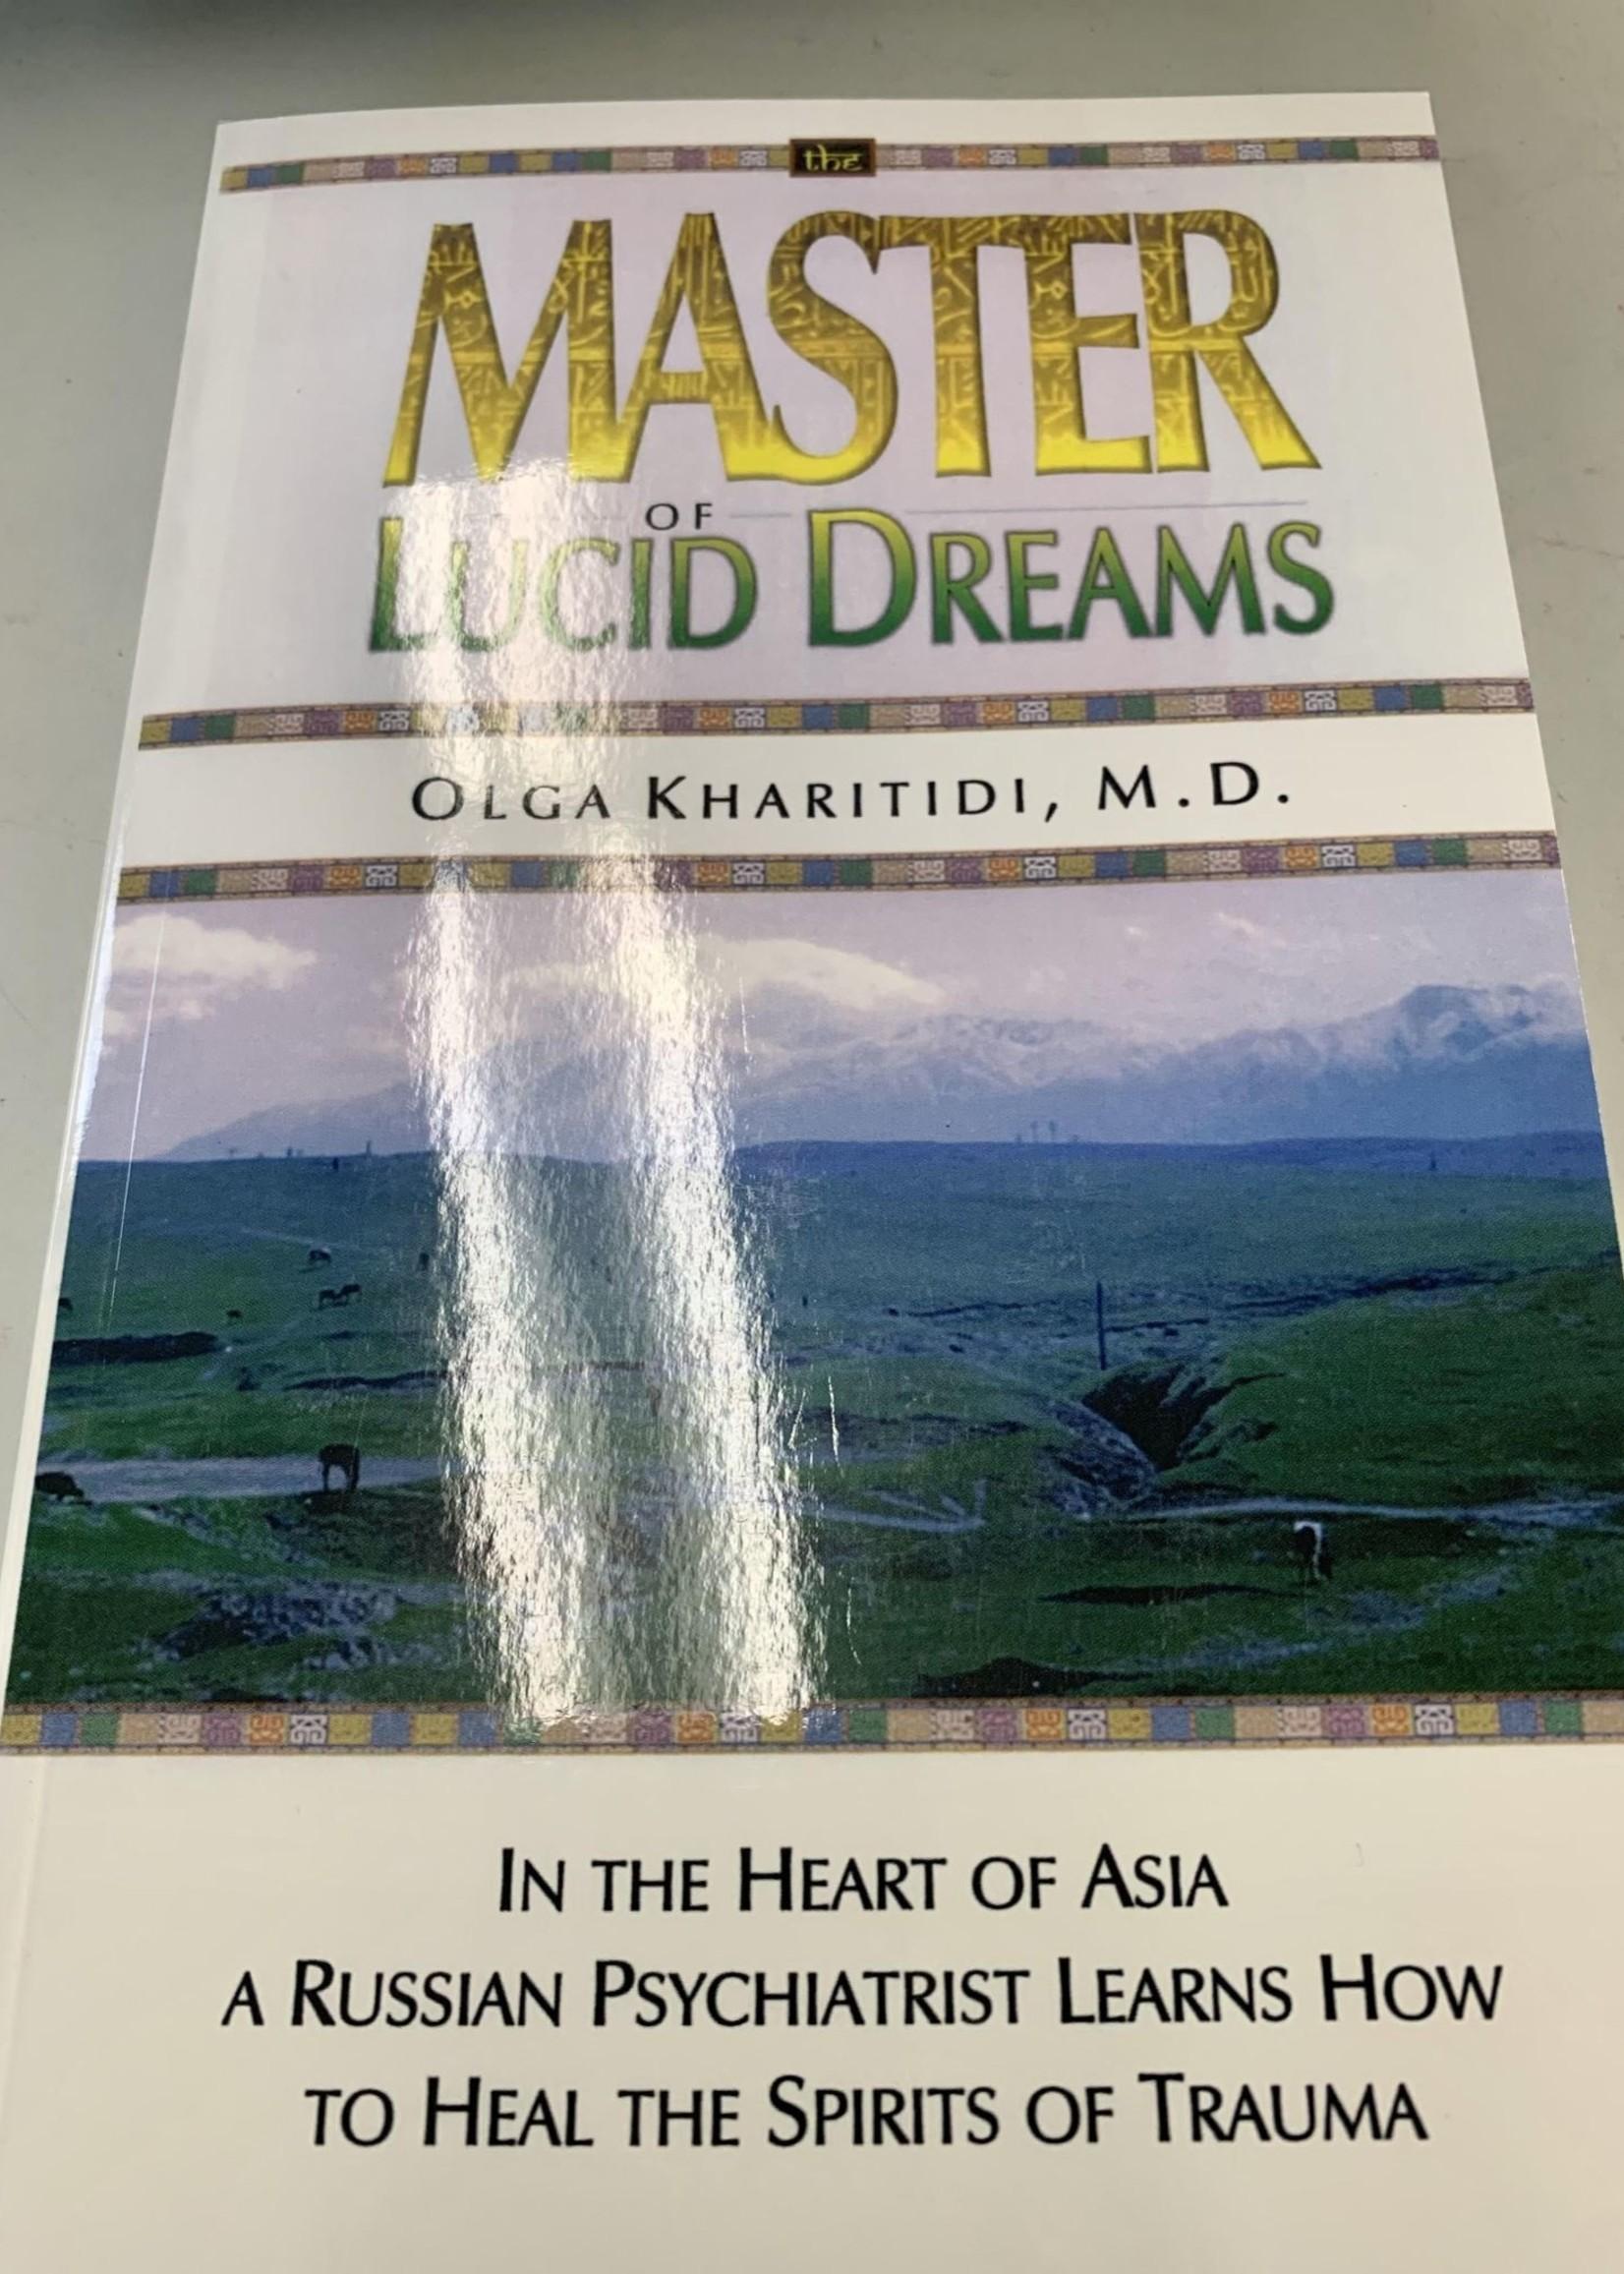 Master of Lucid Dreams - Olga Kharitidi, M.D.